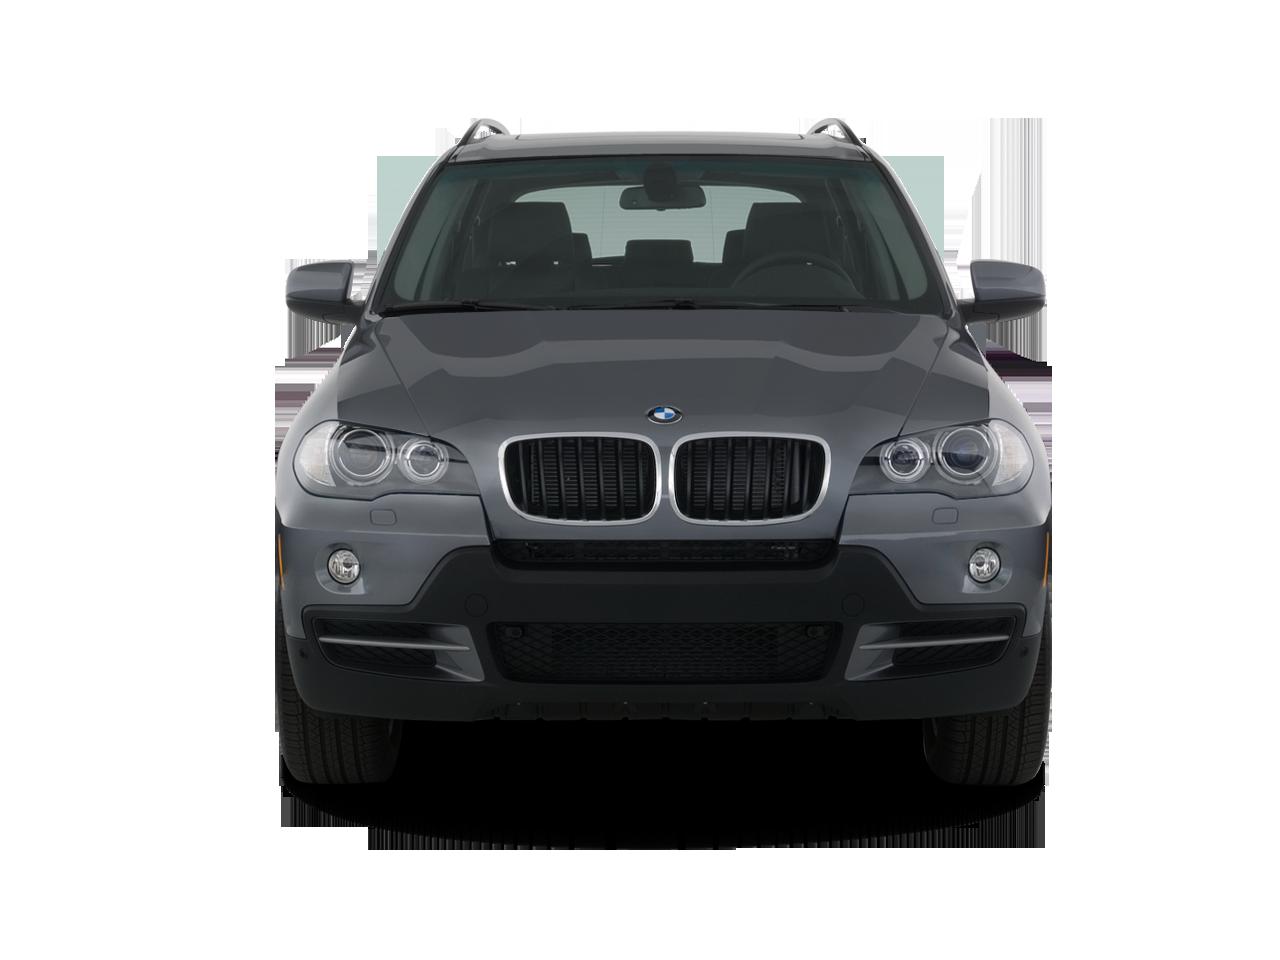 2009 Bmw X5 Xdrive35d Bmw Luxury Crossover Suv Review Automobile Magazine